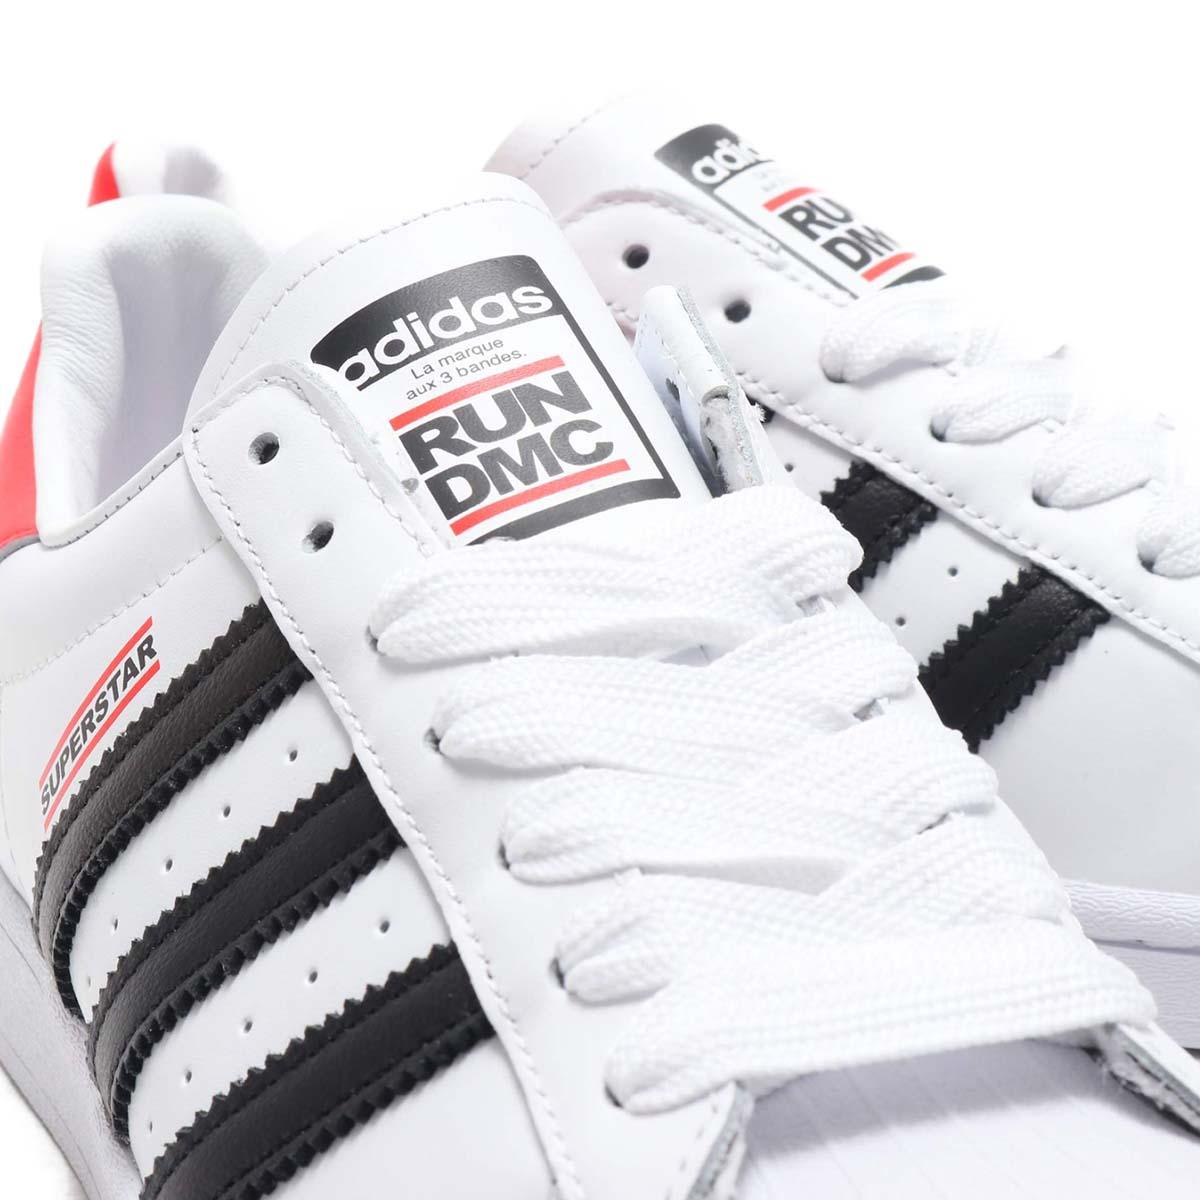 adidas SUPERSTAR 50 RUN-DMC FOOTWEAR WHITE / CORE BLACK / HIGHREZ RED FX7616 アディダス スーパースター 50 RUN-DMC ホワイト/ブラック/レッド